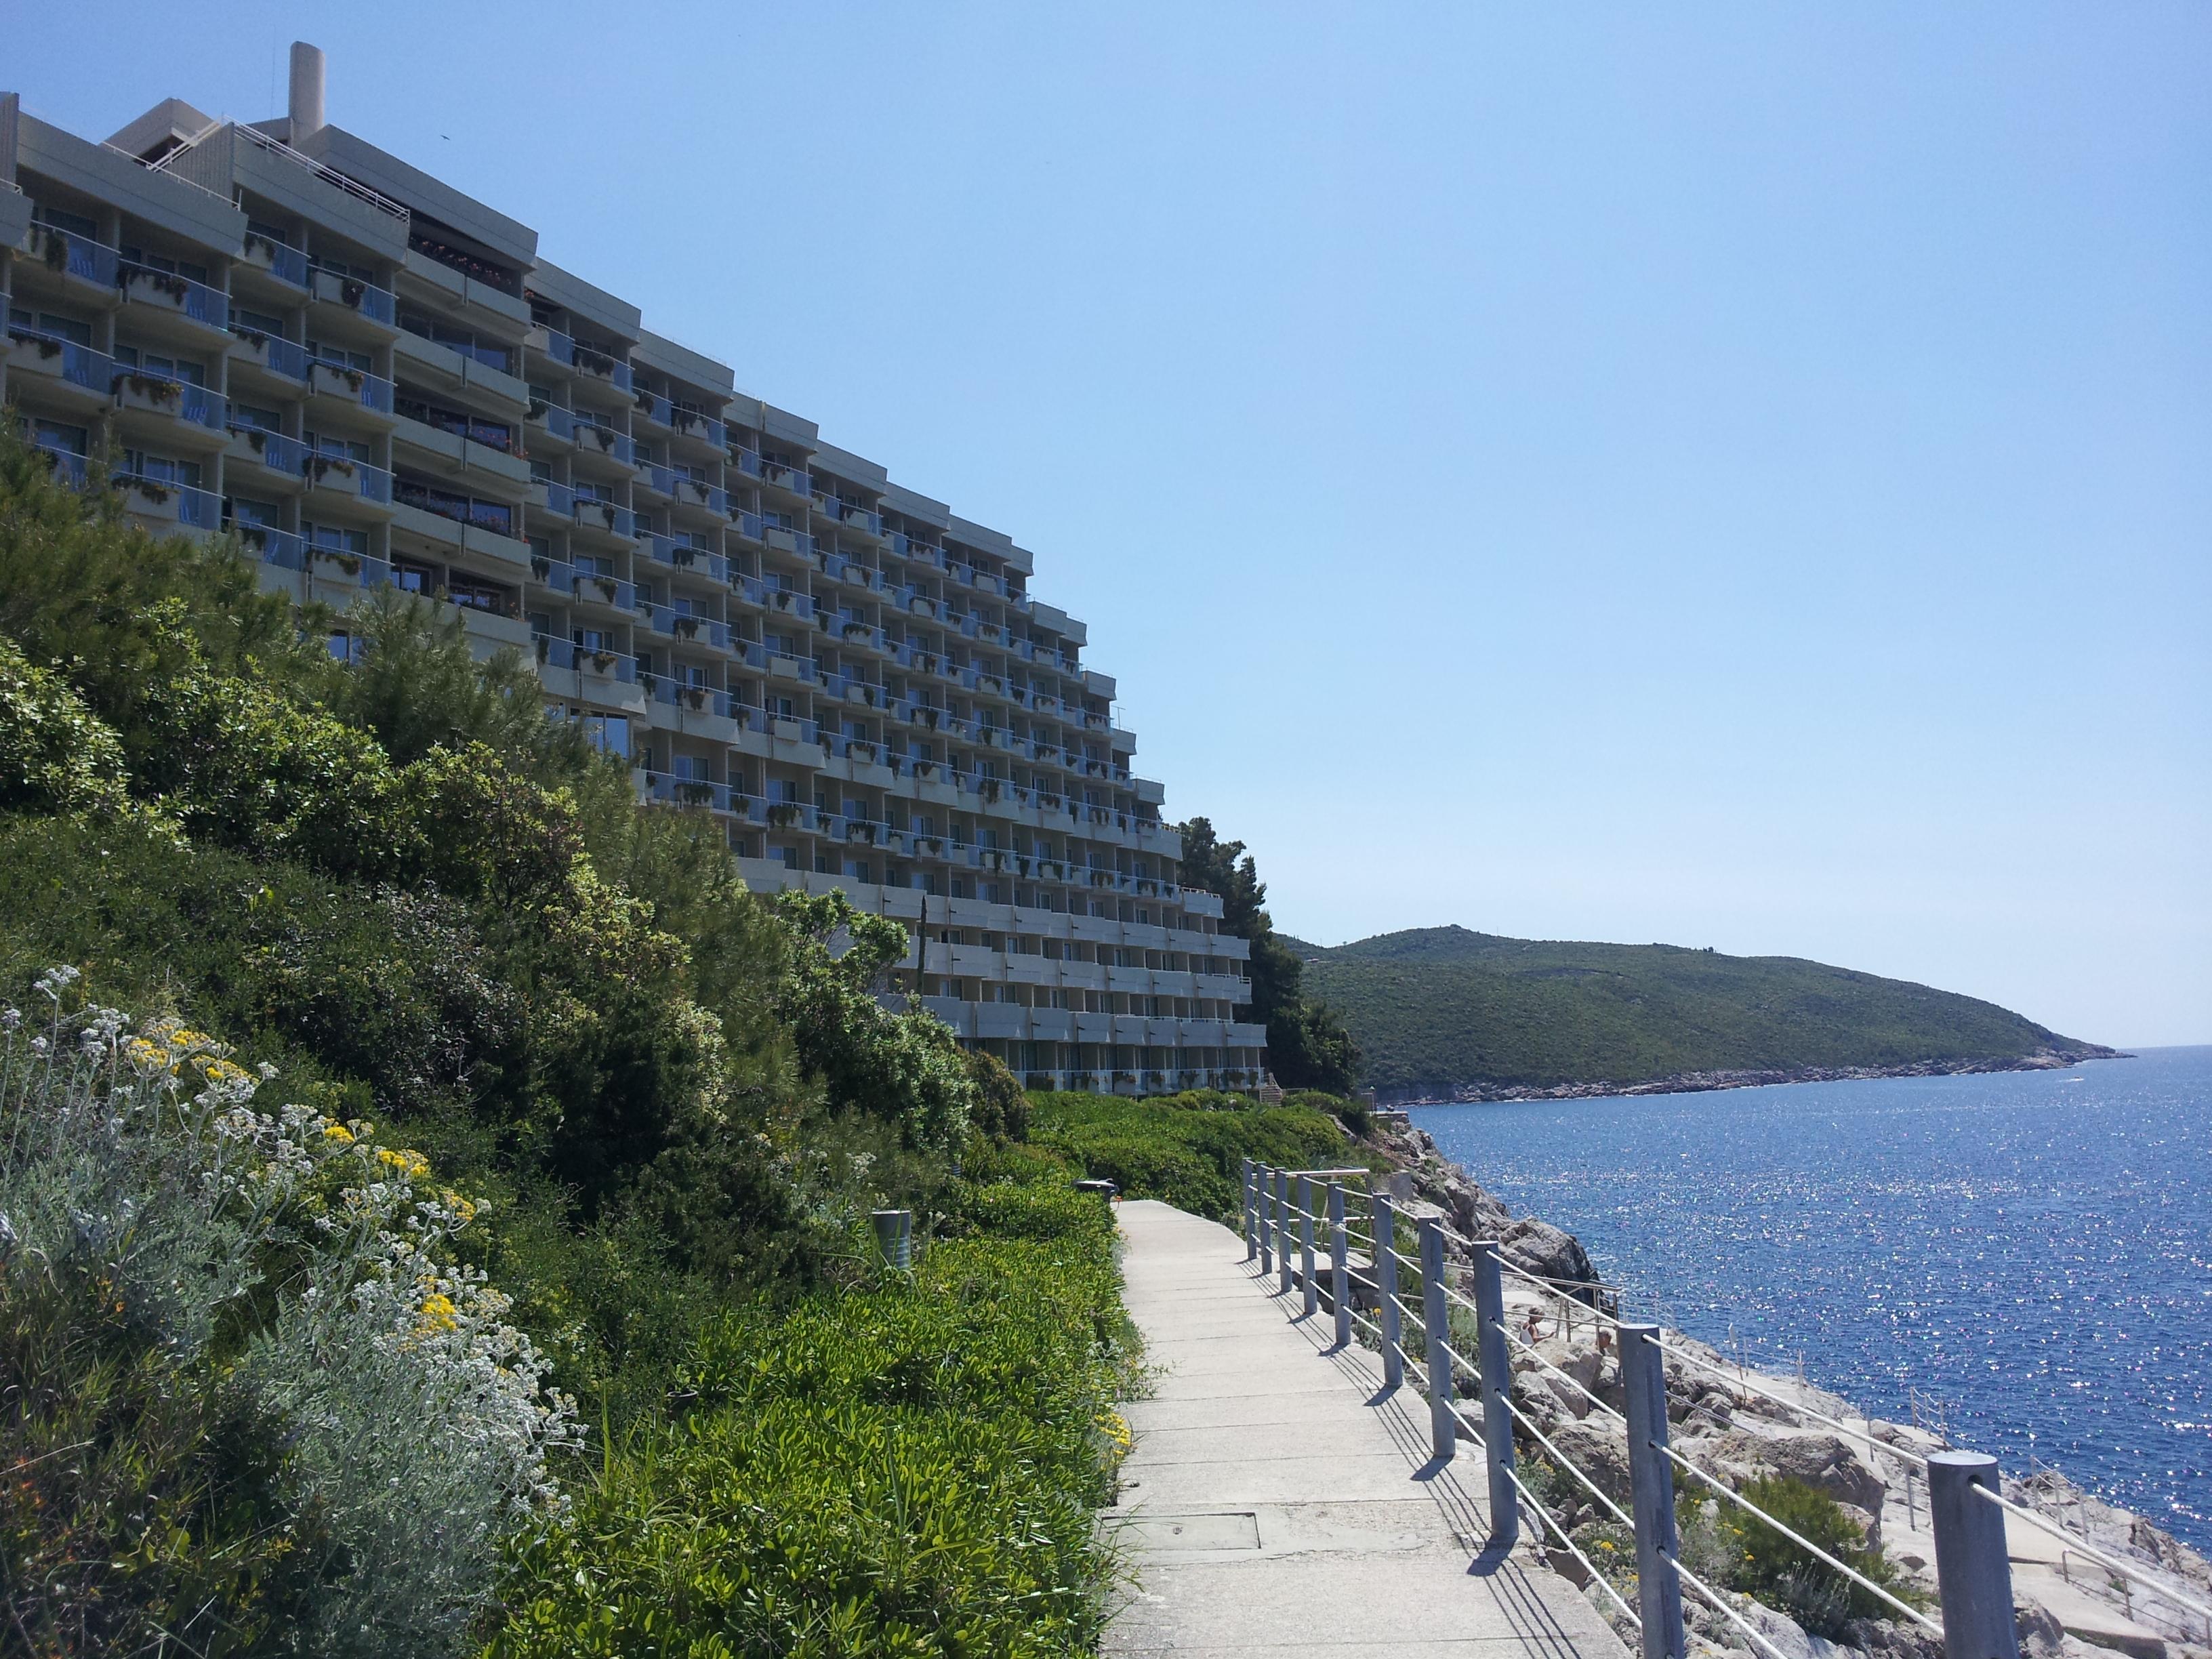 Ervaring Hotel Croatia (Cavtat, Kroatië)